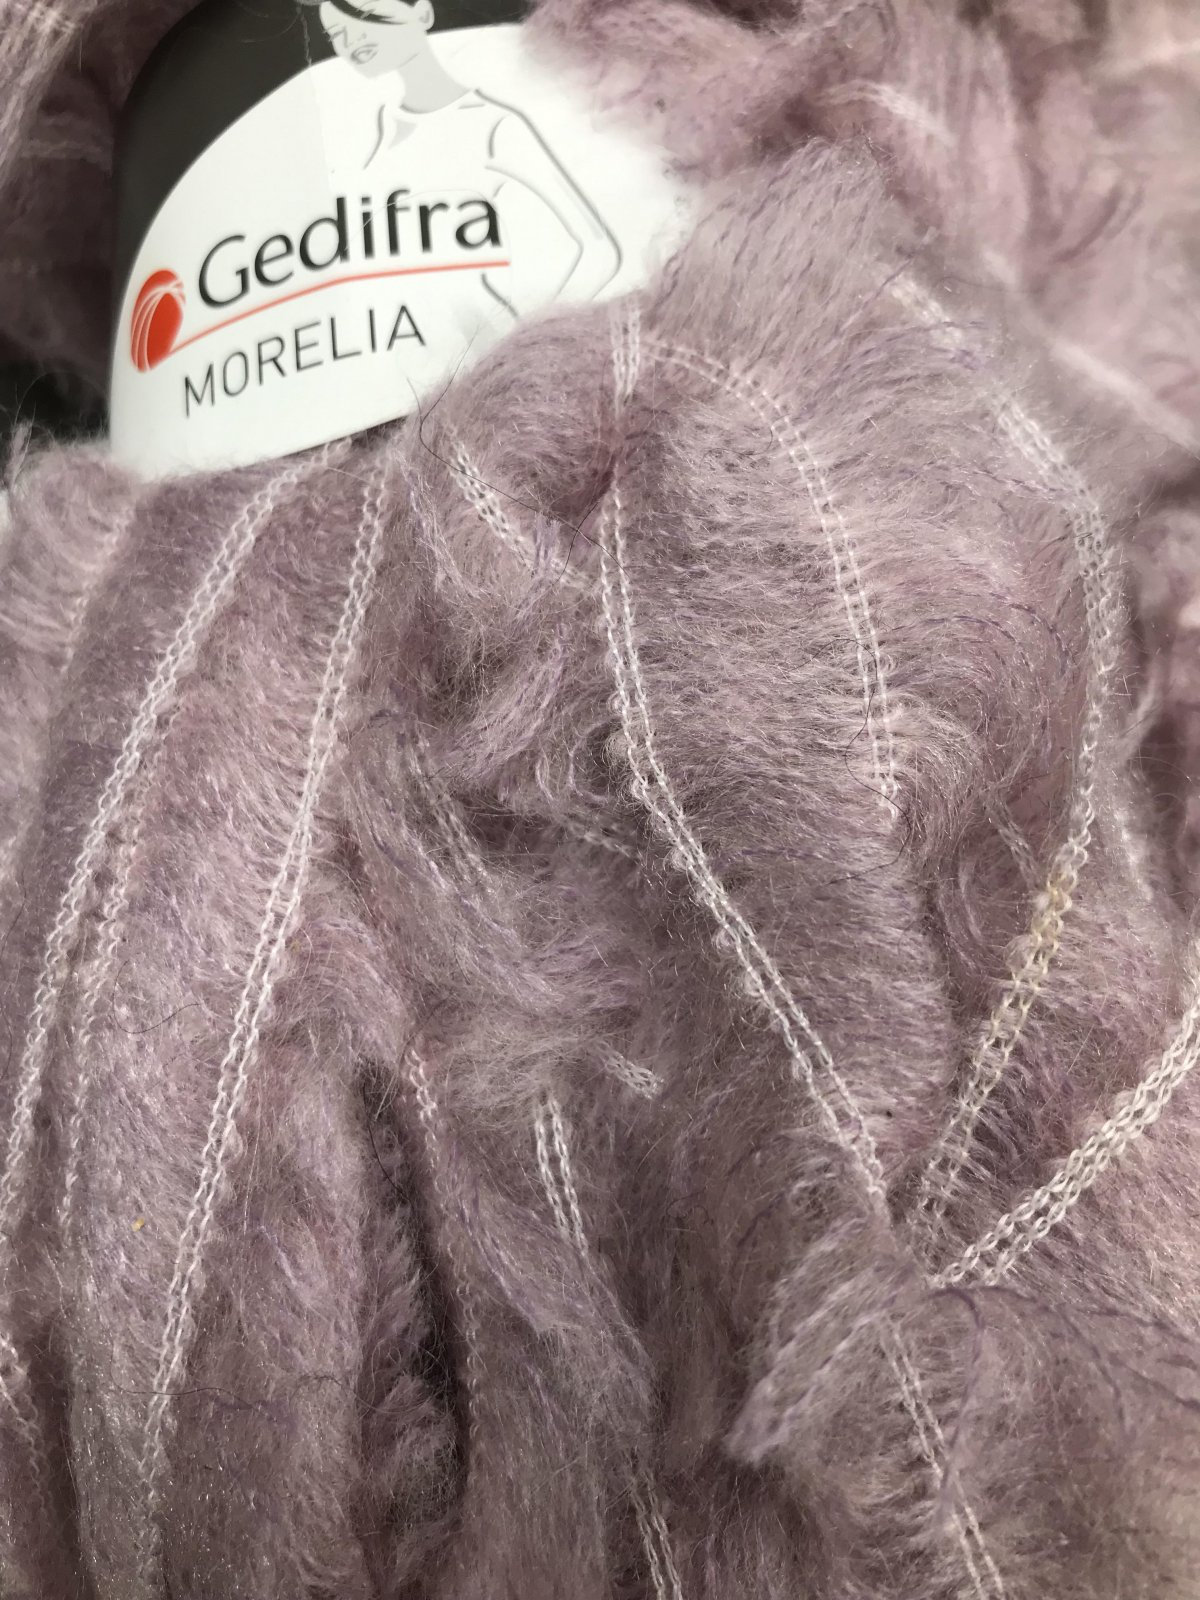 Pink 1457 Gedifra Morelia Ribbon 37/35/28 acryl/poly/mohair 36m #15mm